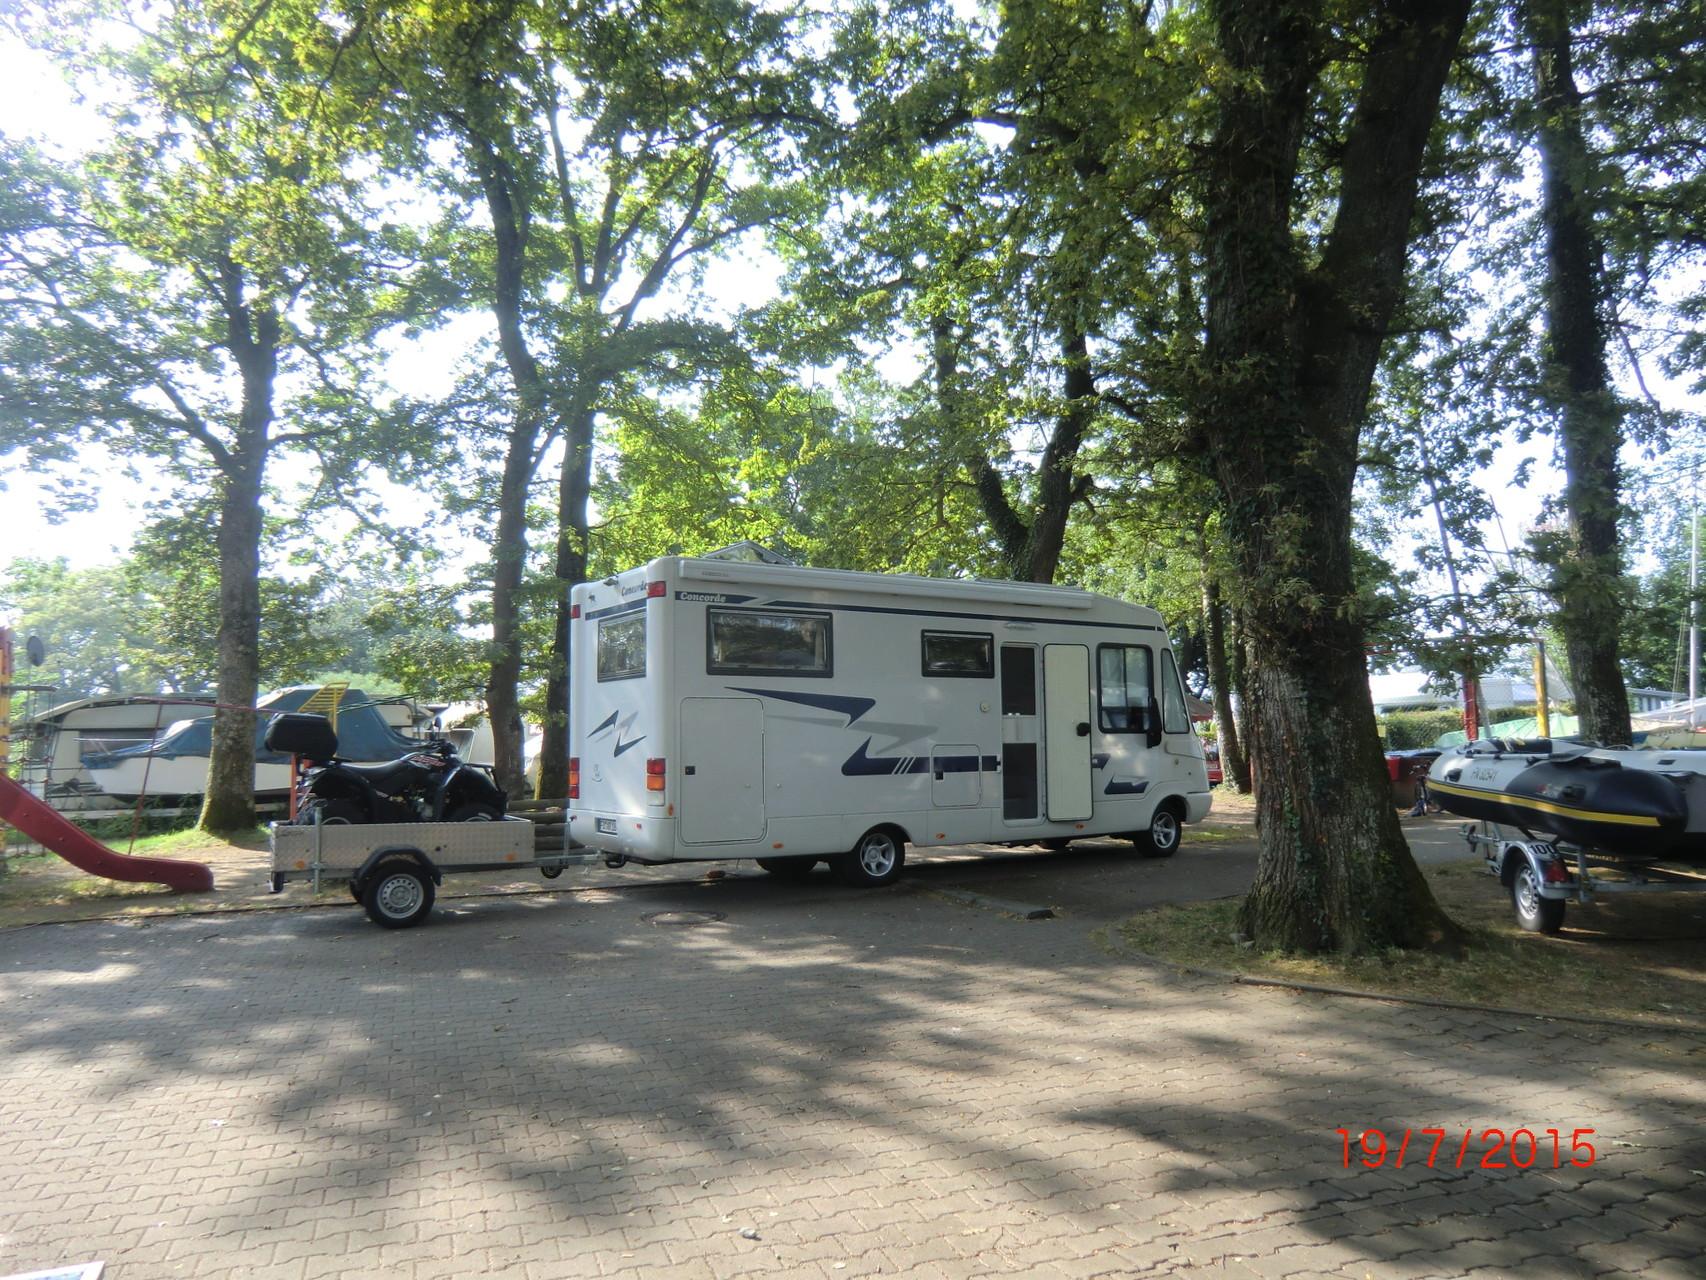 Campingplatz in Kressbronn